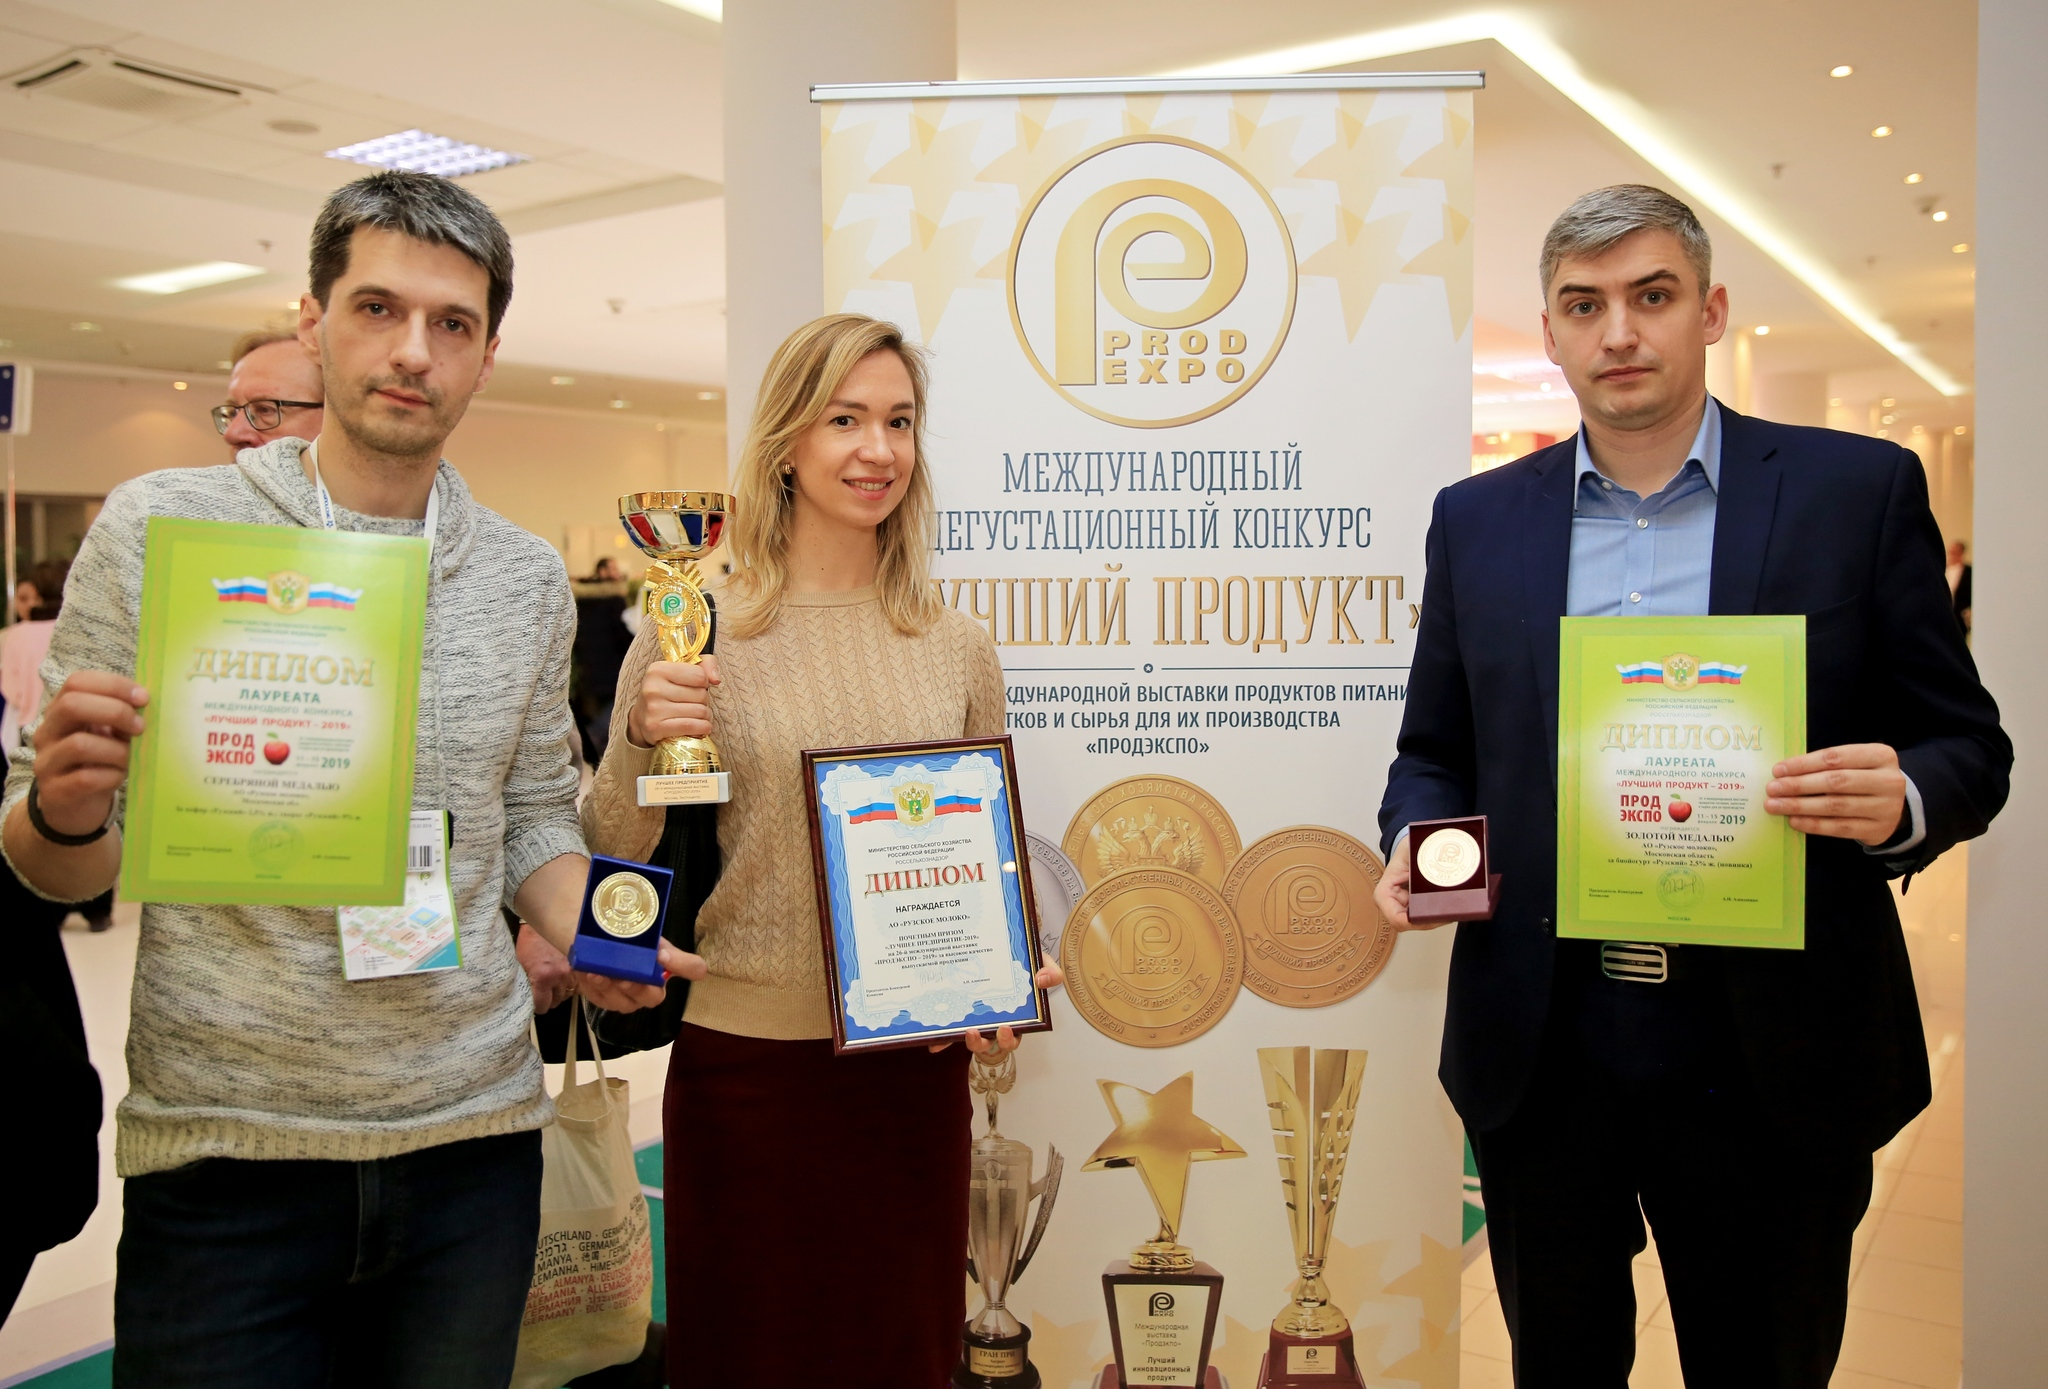 Награды на ПРОДЭКСПО - Золото, серебро и кубок